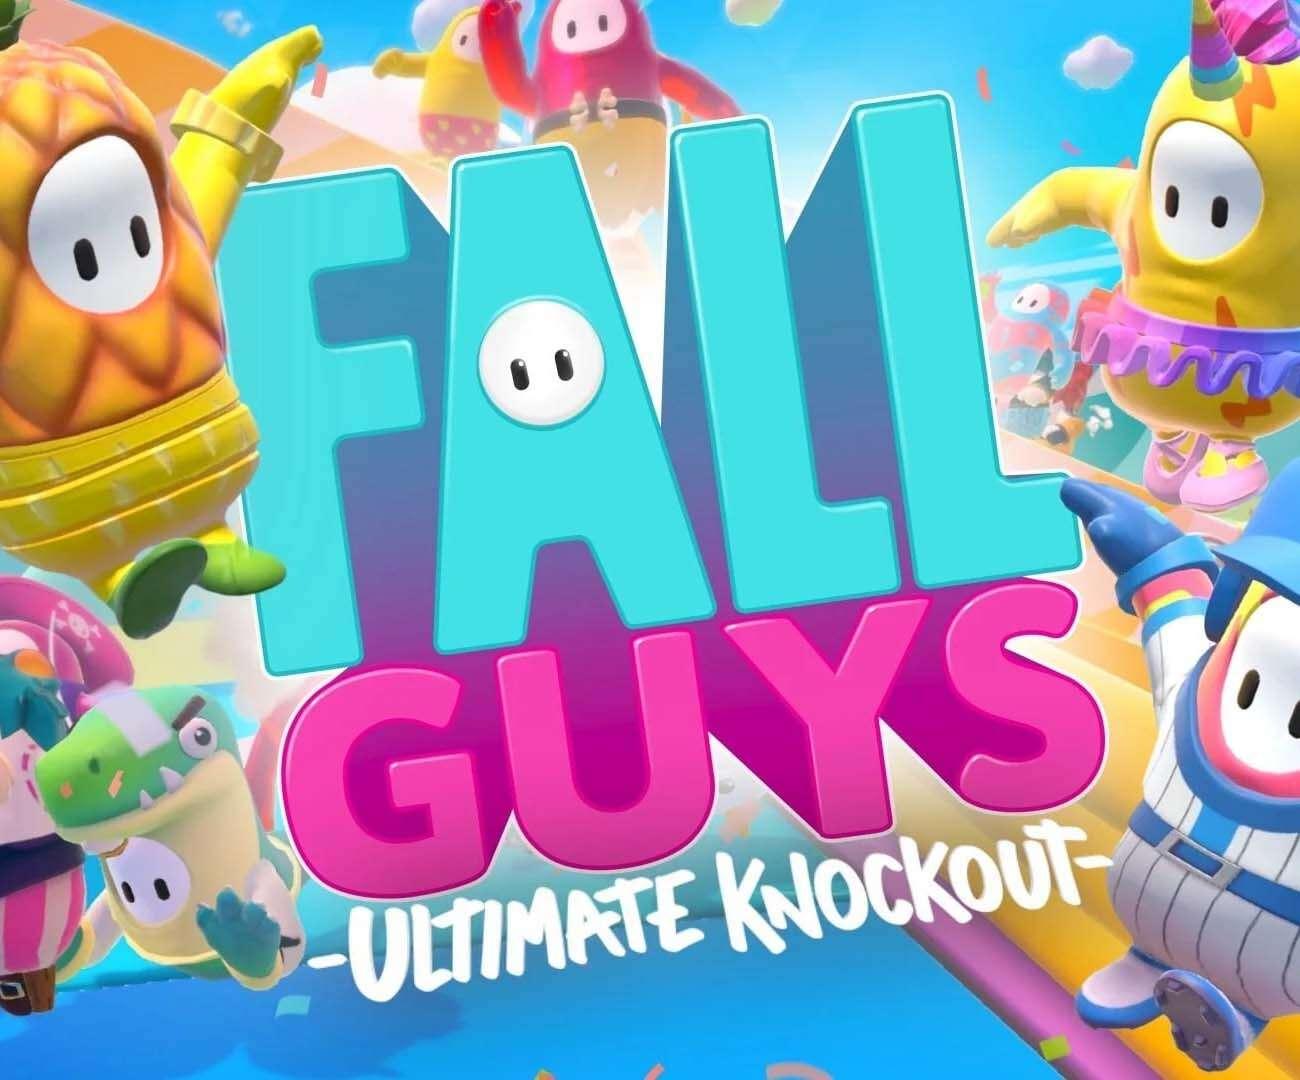 fall guys, split screen